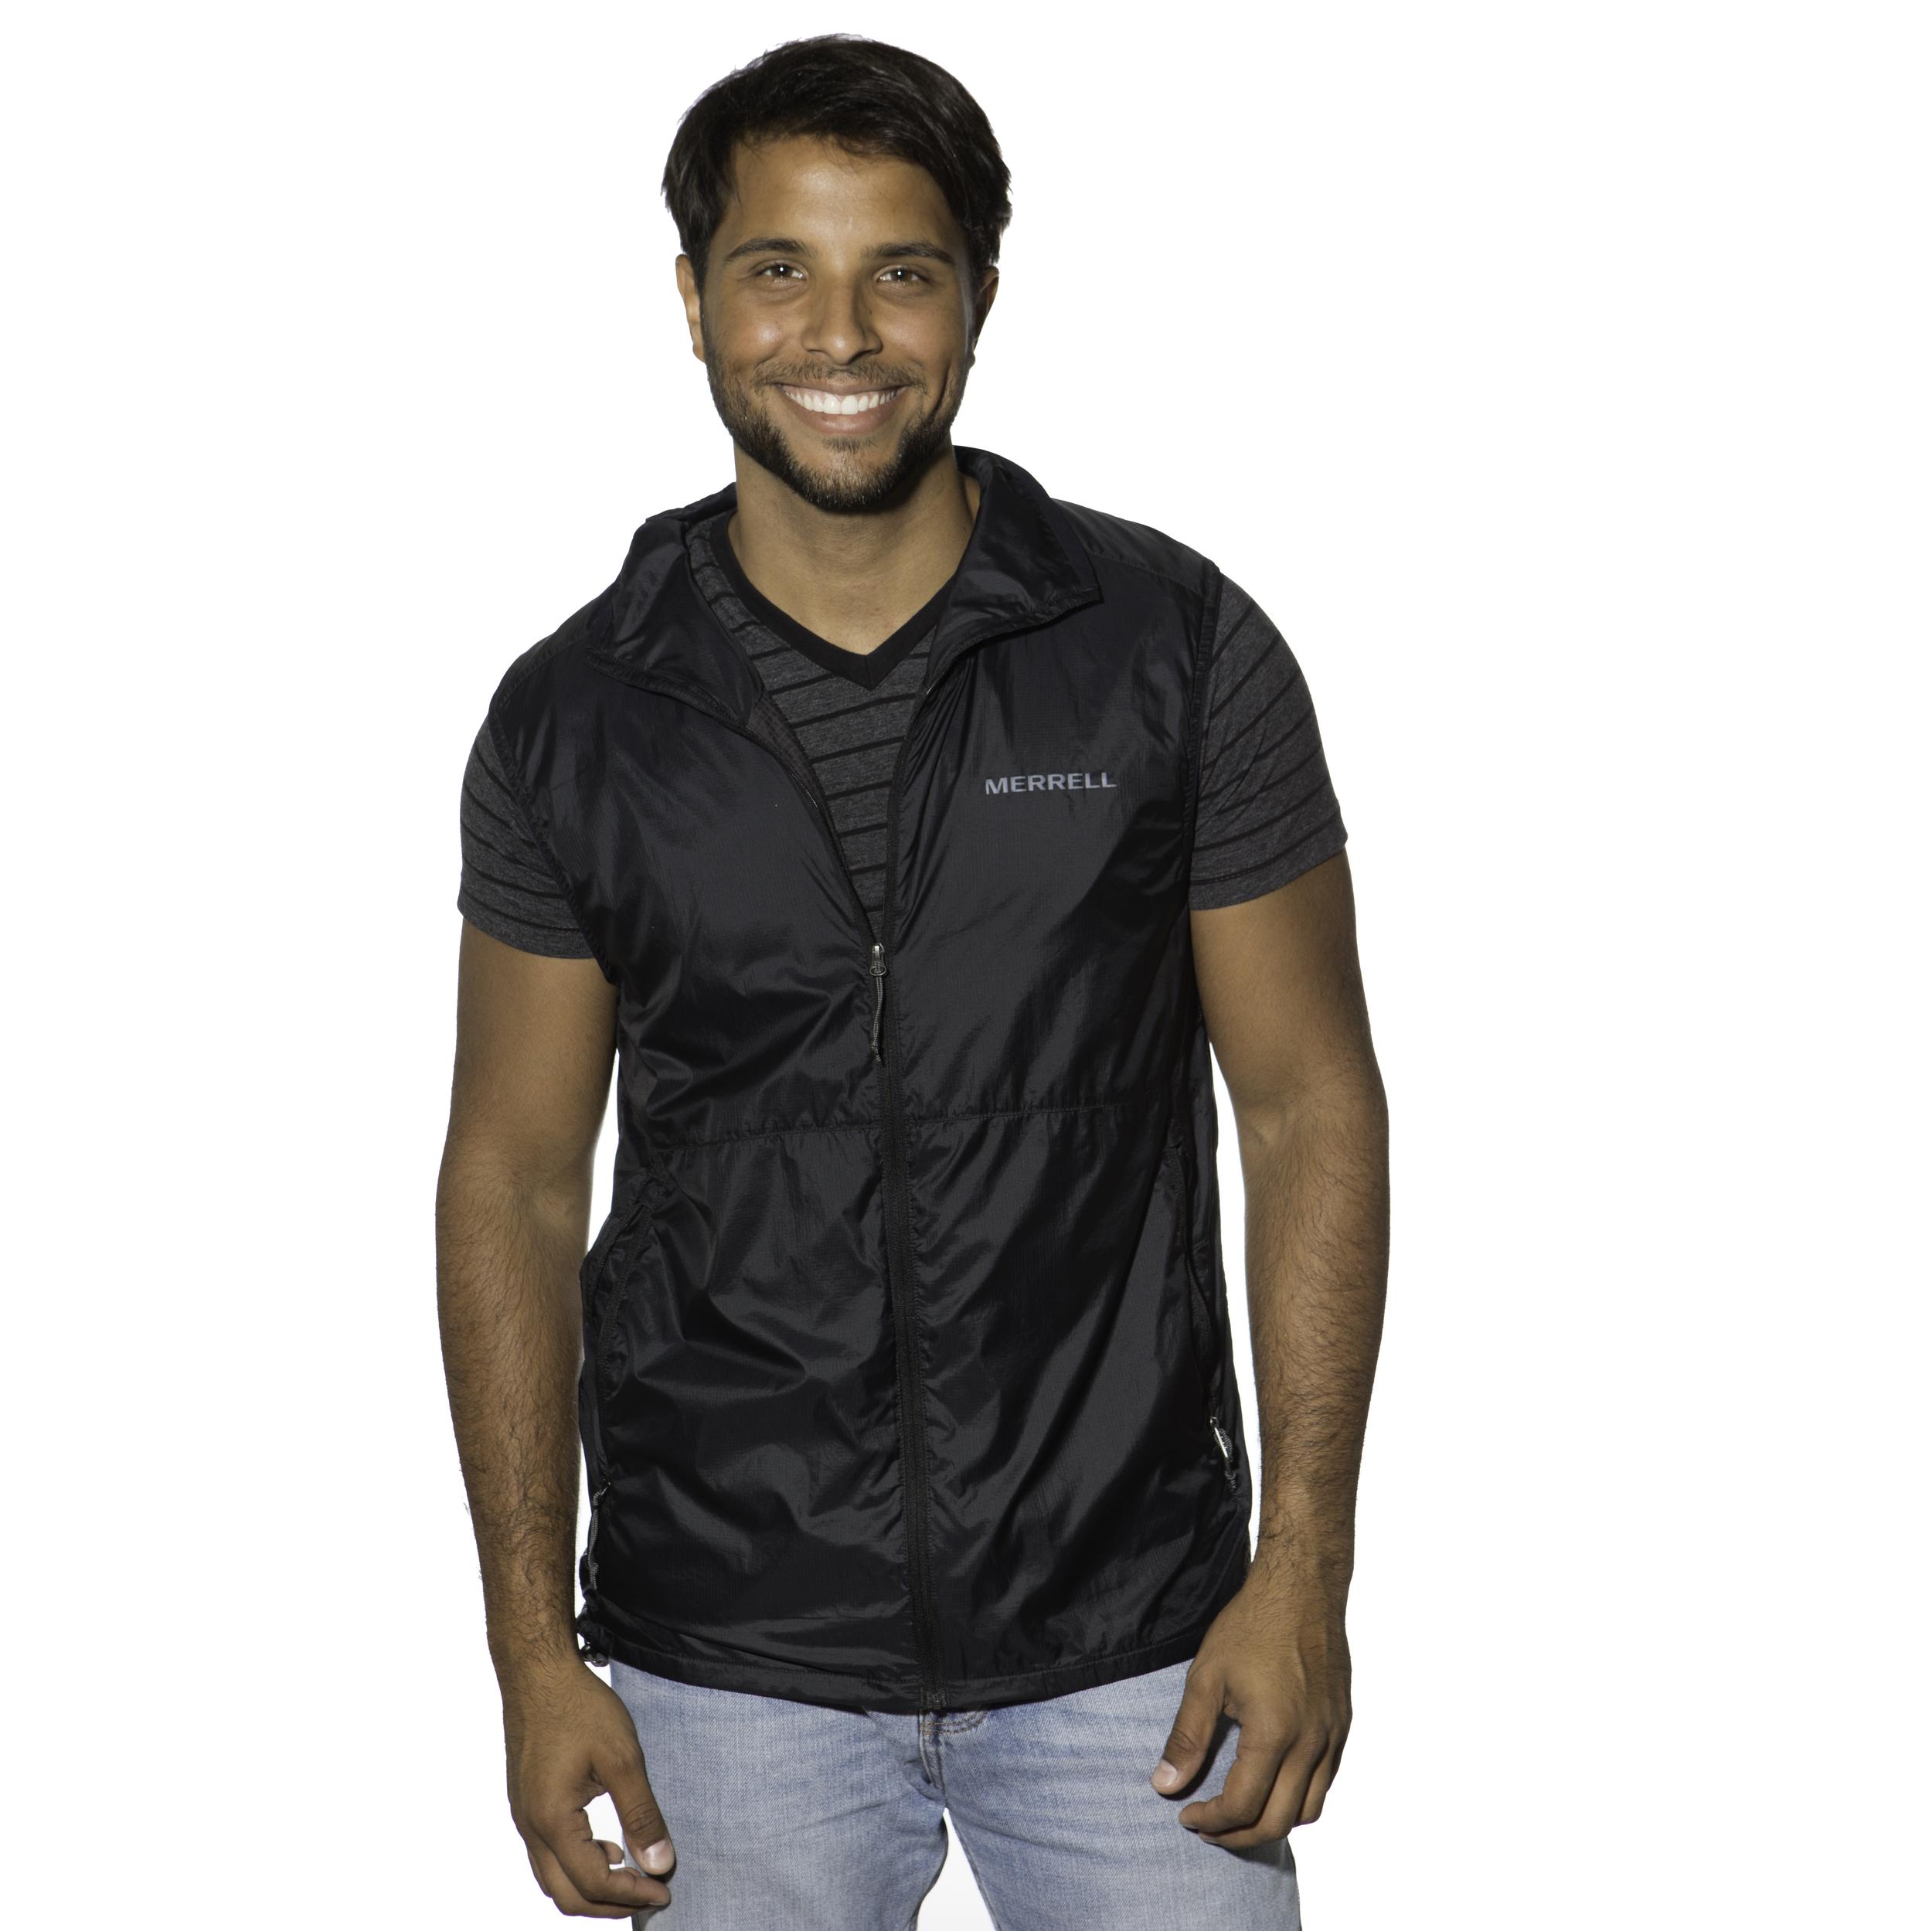 black_vest-on-model-front.jpg